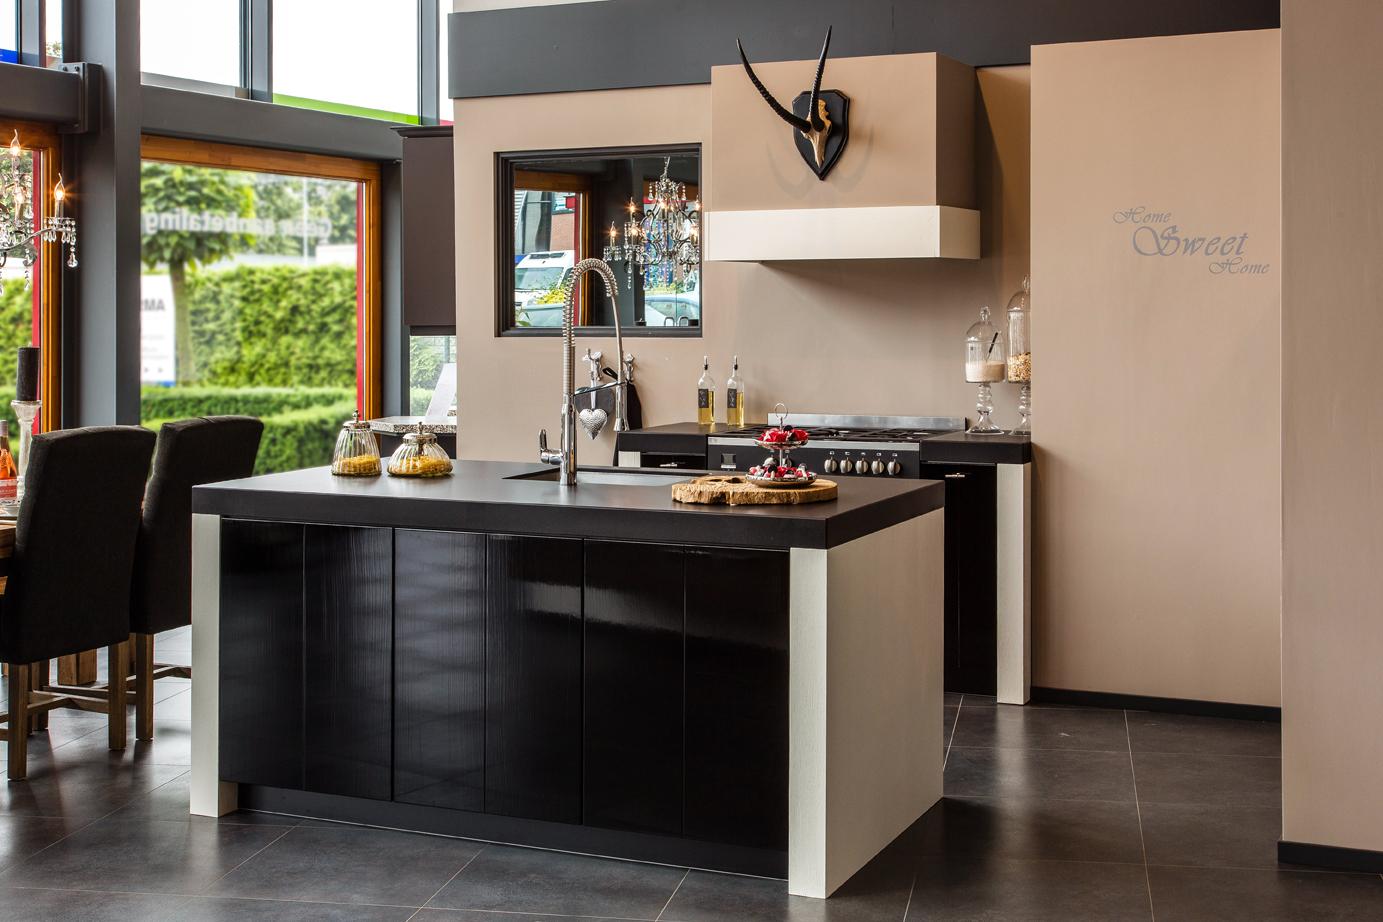 Strakke Keuken Met Eiland : Keuken met keukeneiland – DB Keukens